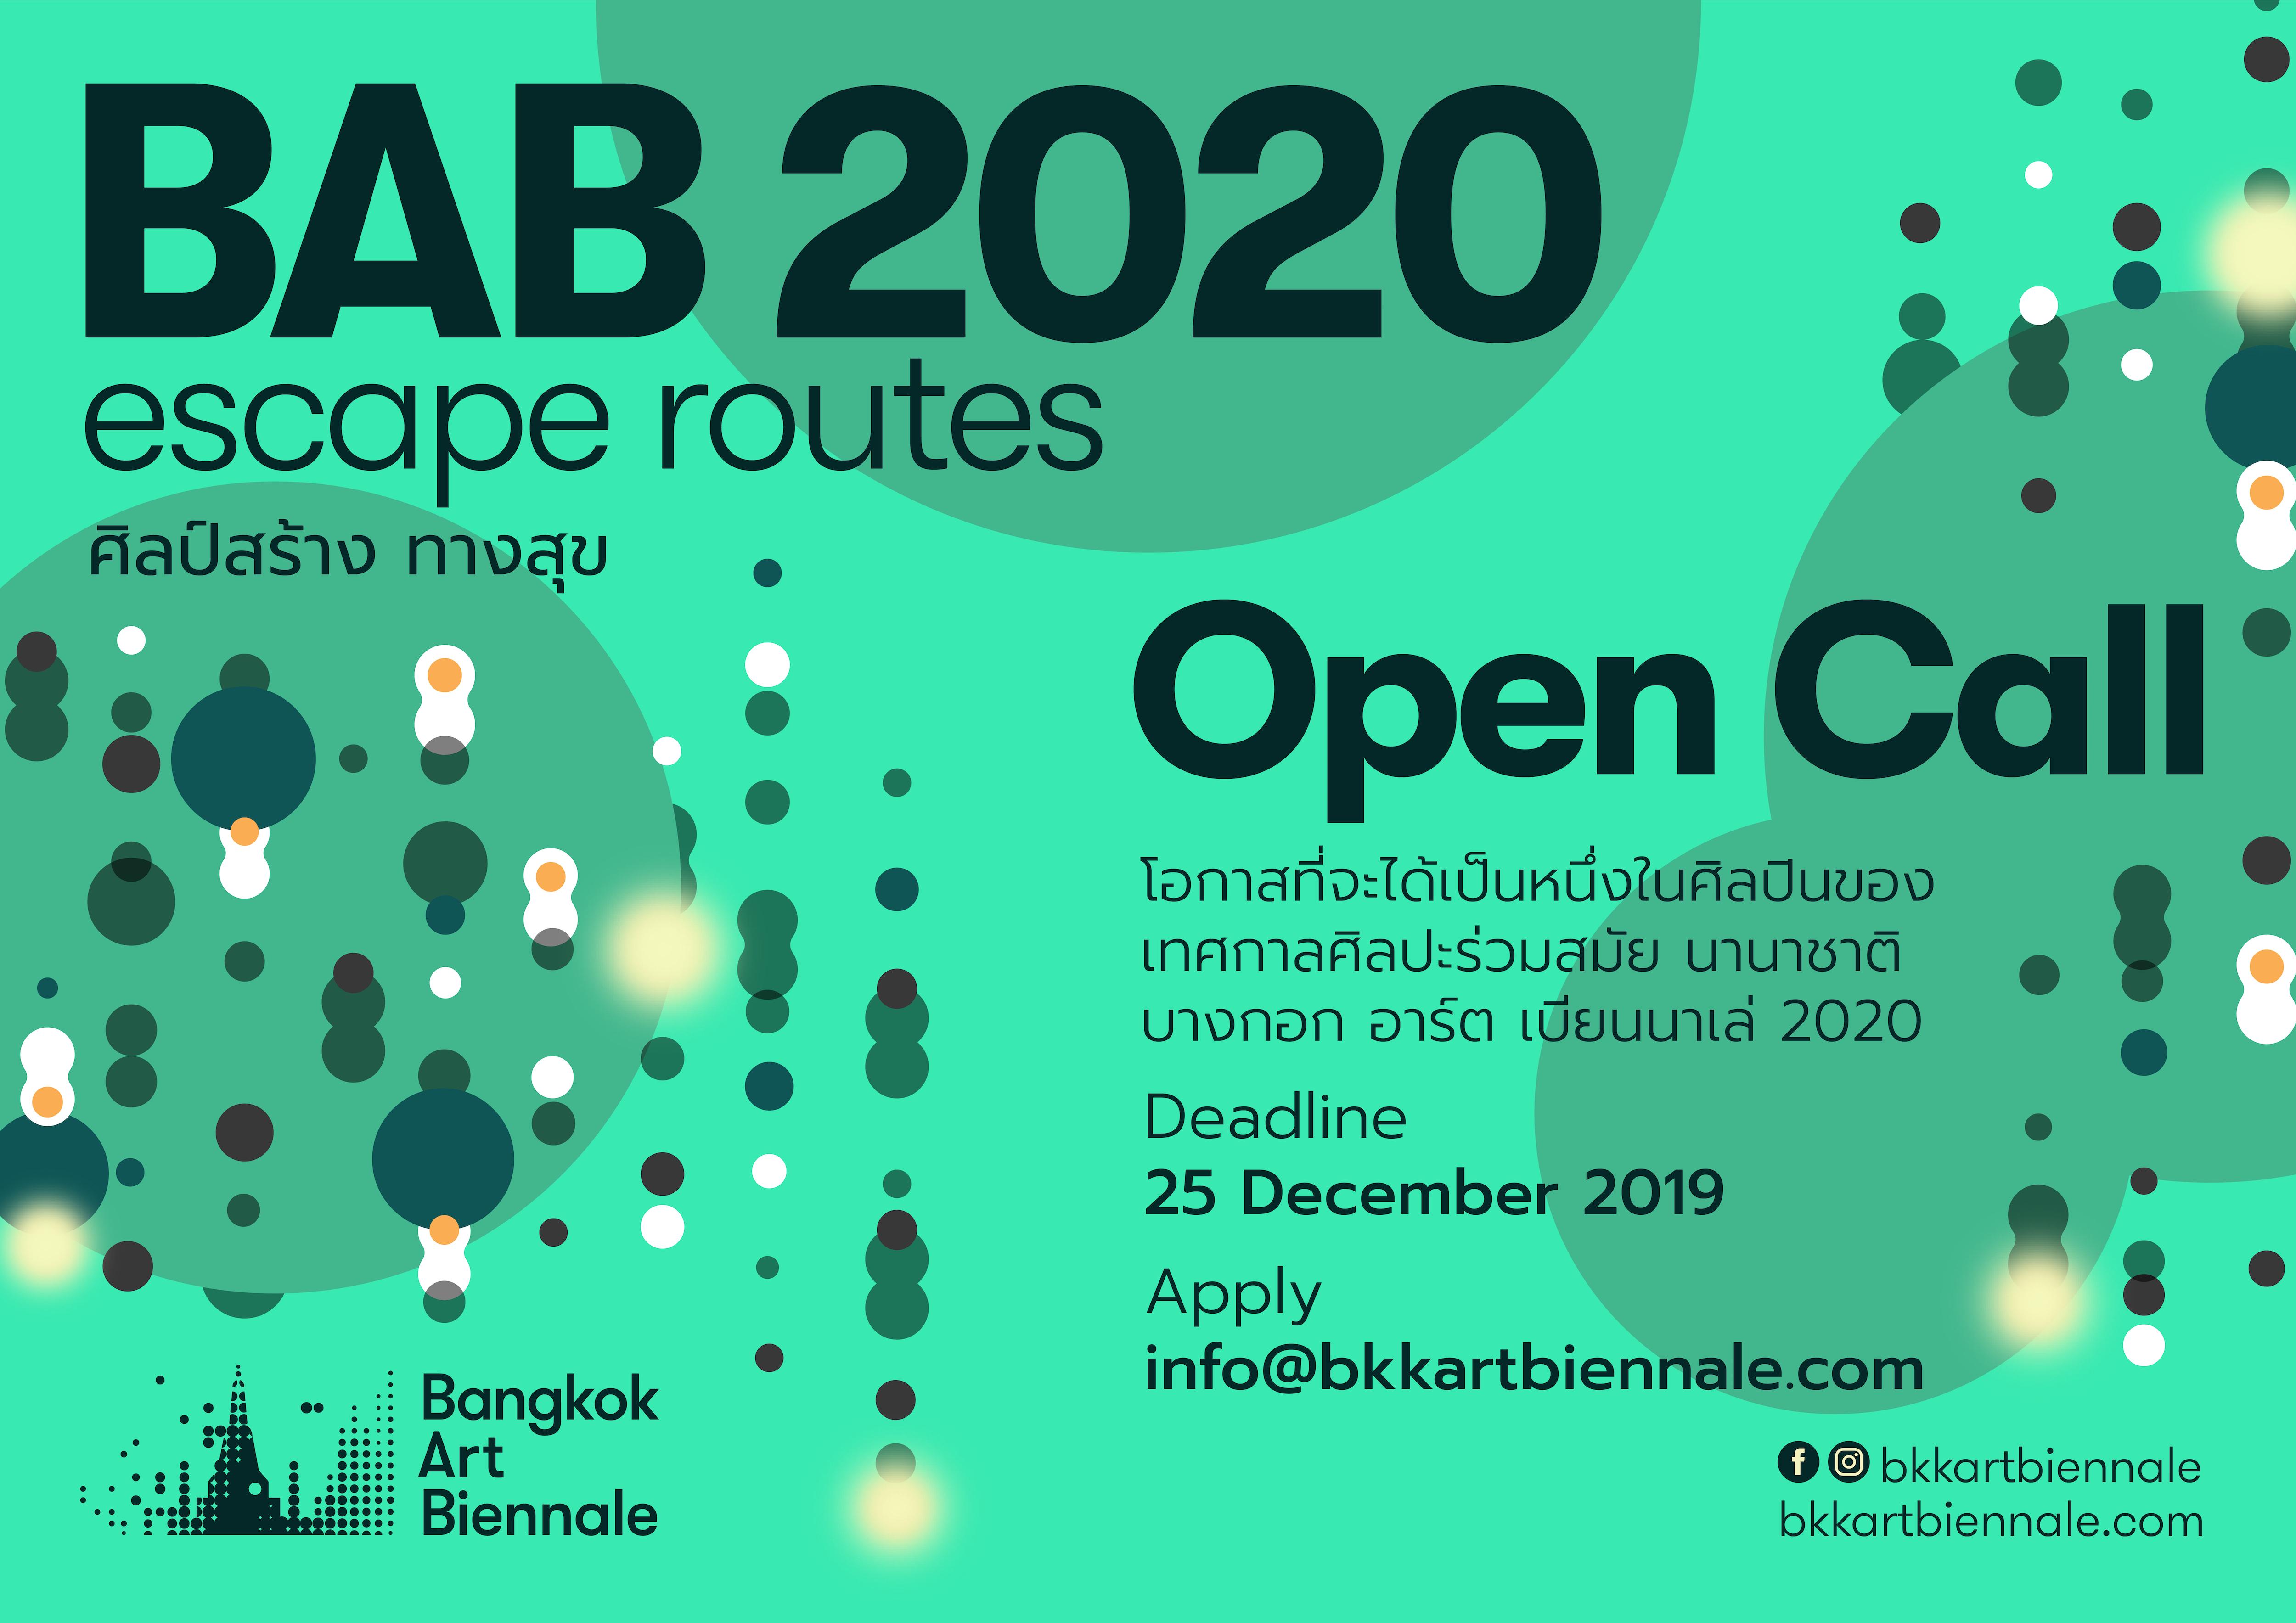 Open Call BAB 2020 Application